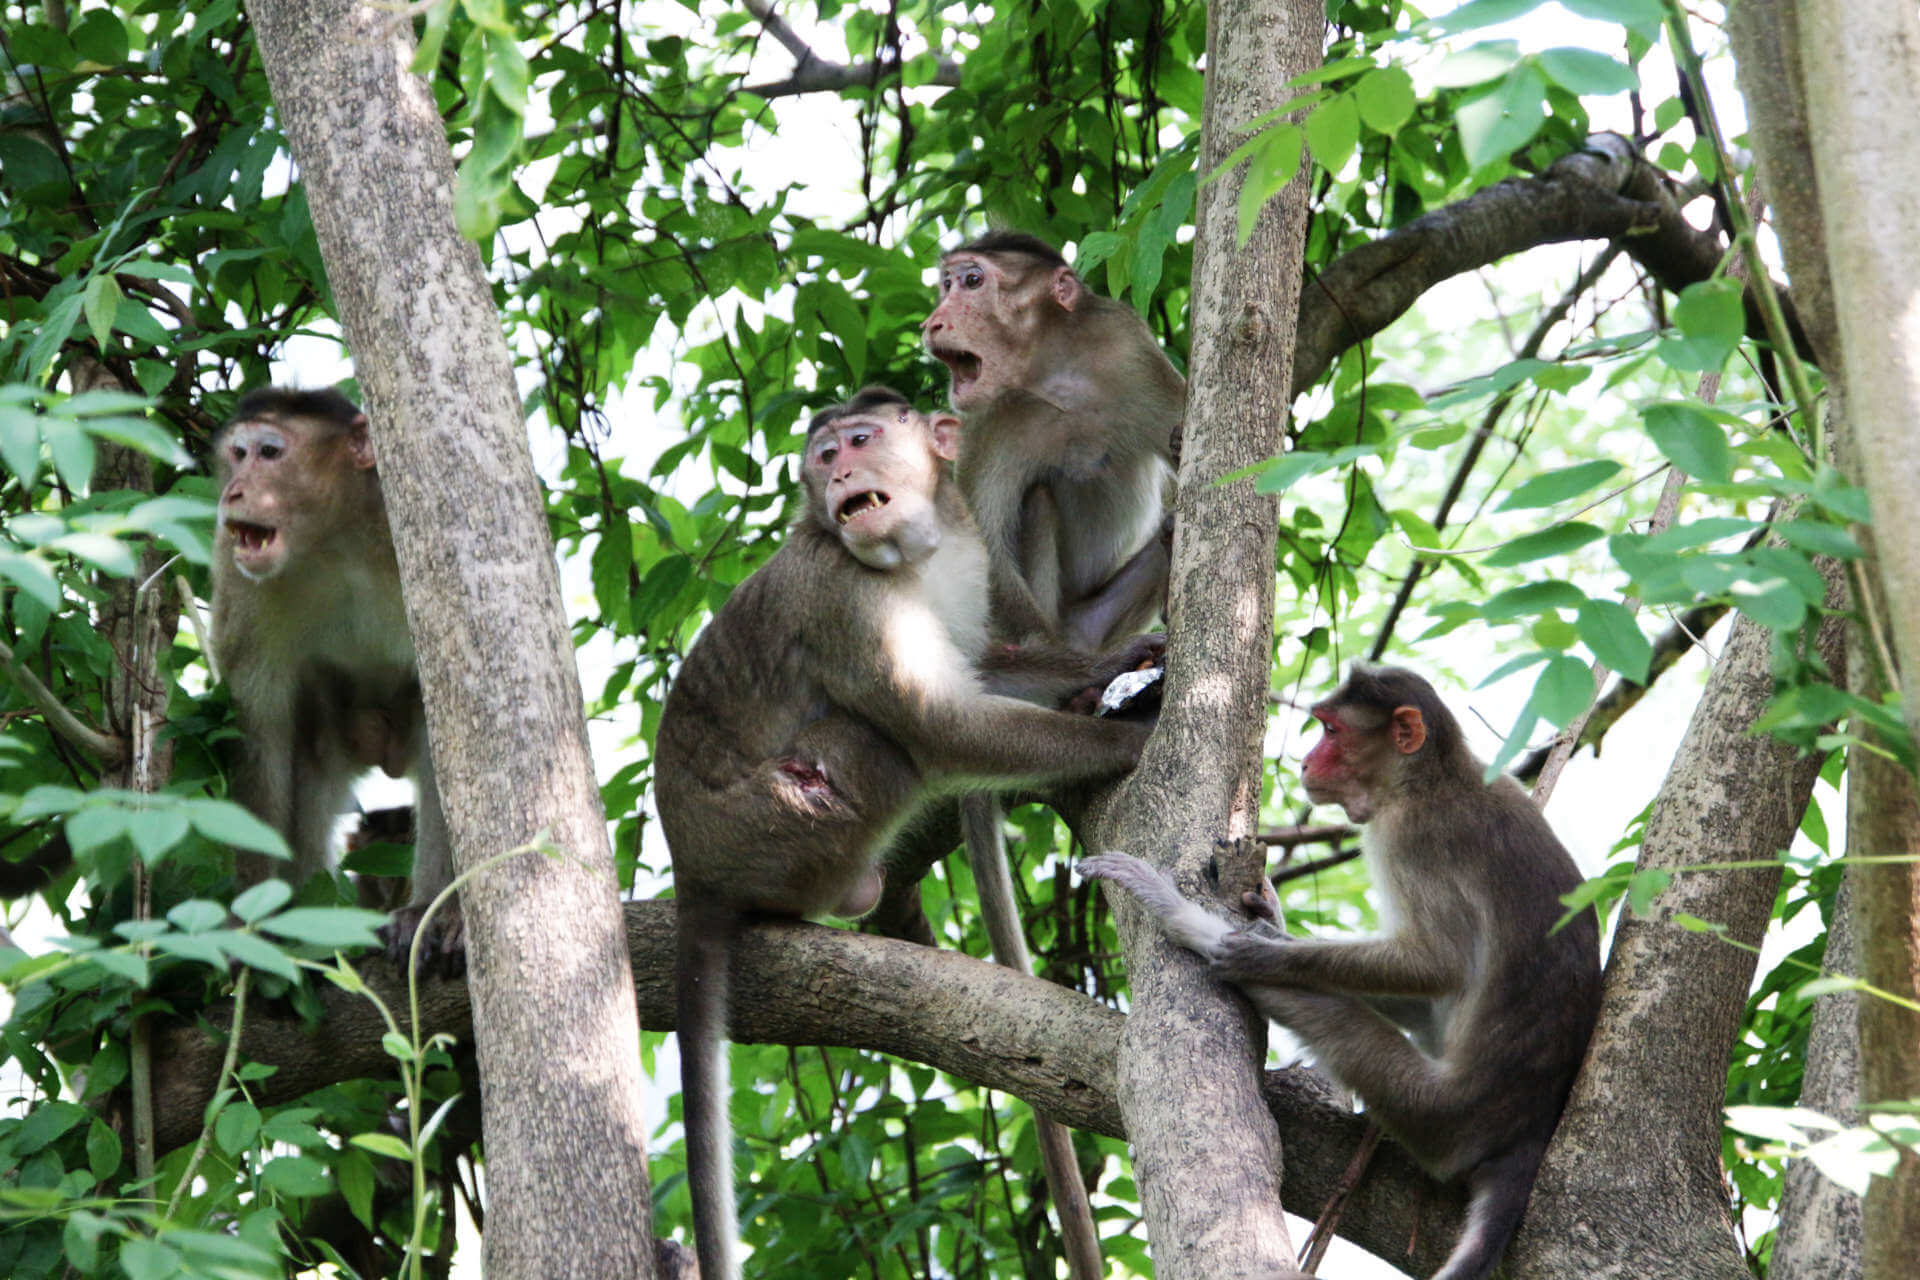 Indien Mumbai Elephanta Island Affen im Baum 2